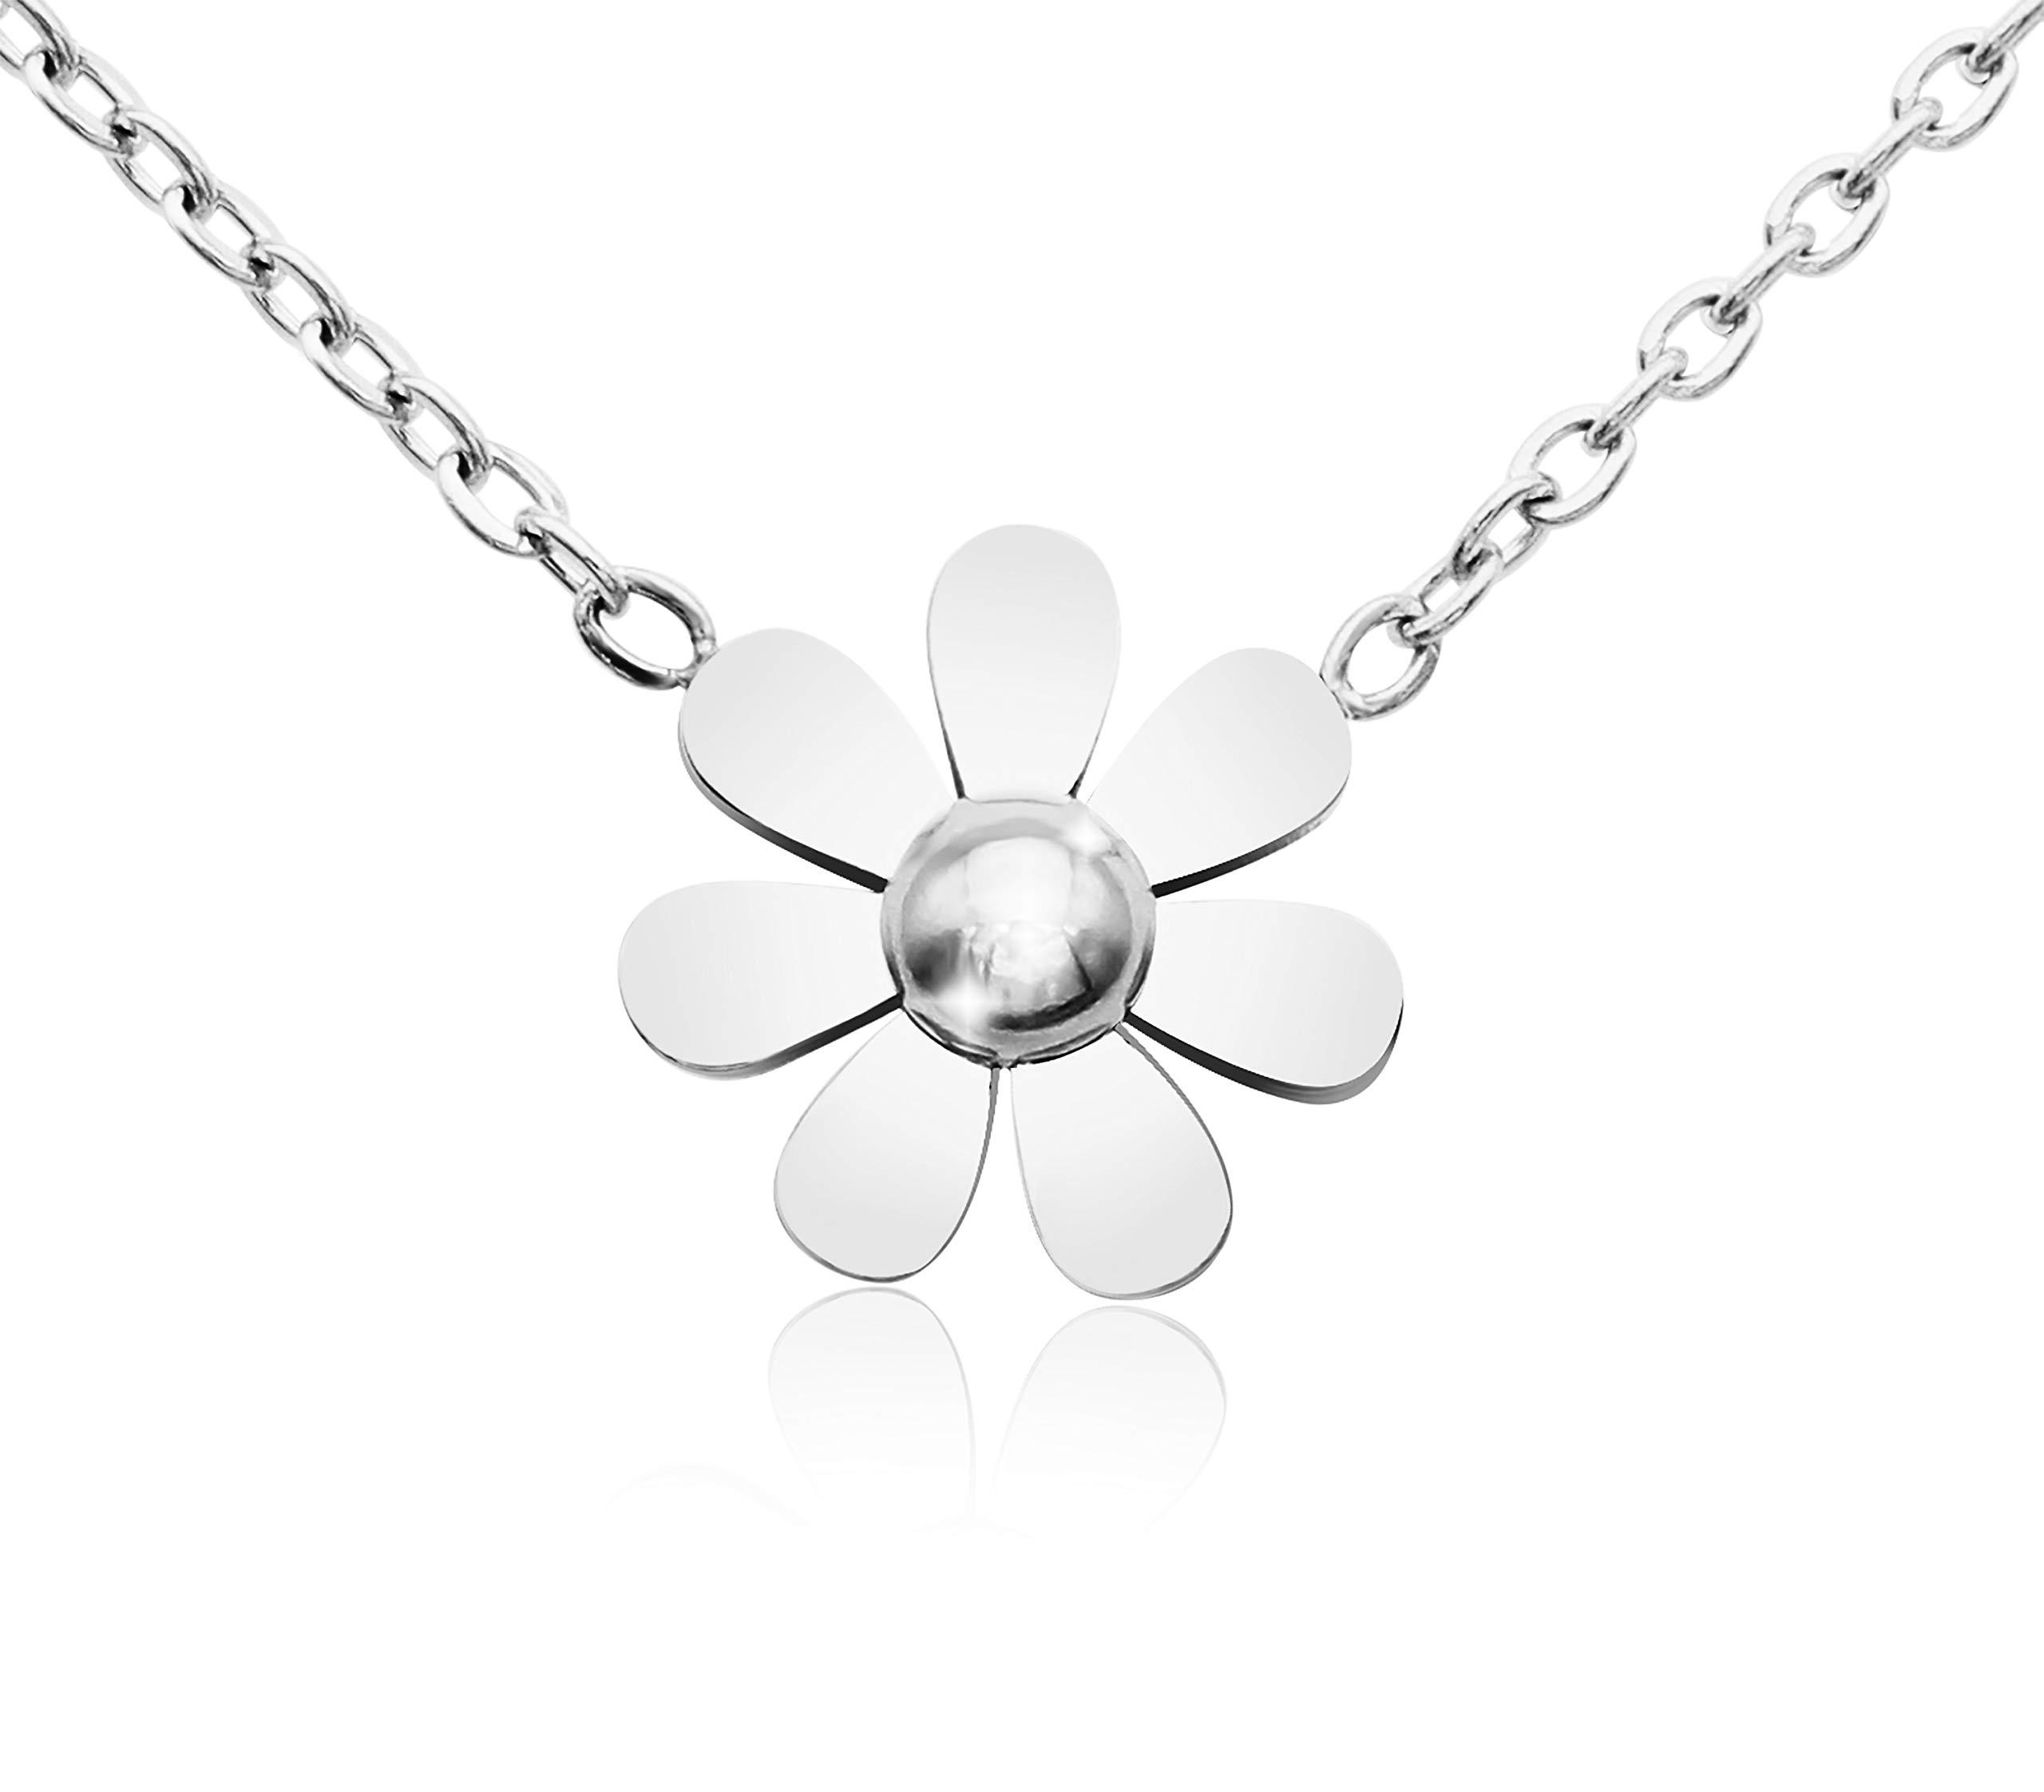 KristLand - 18k Gold Plated Titanium Steel Cute Sun Flower Short Necklace Rose Gold Color Delicate Adjustable Choker